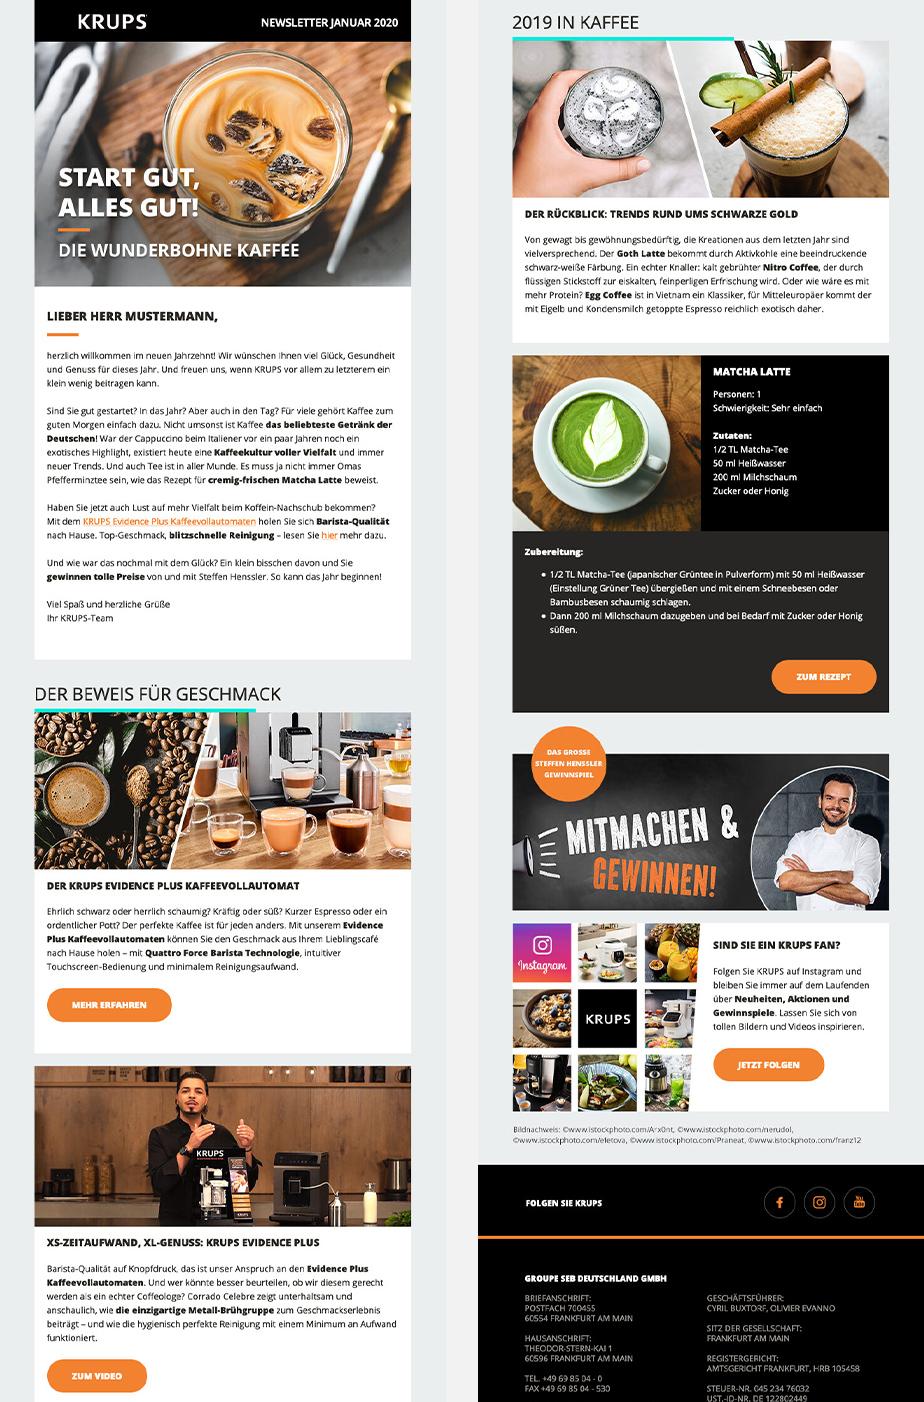 web_krups_Newsletter_01_ik